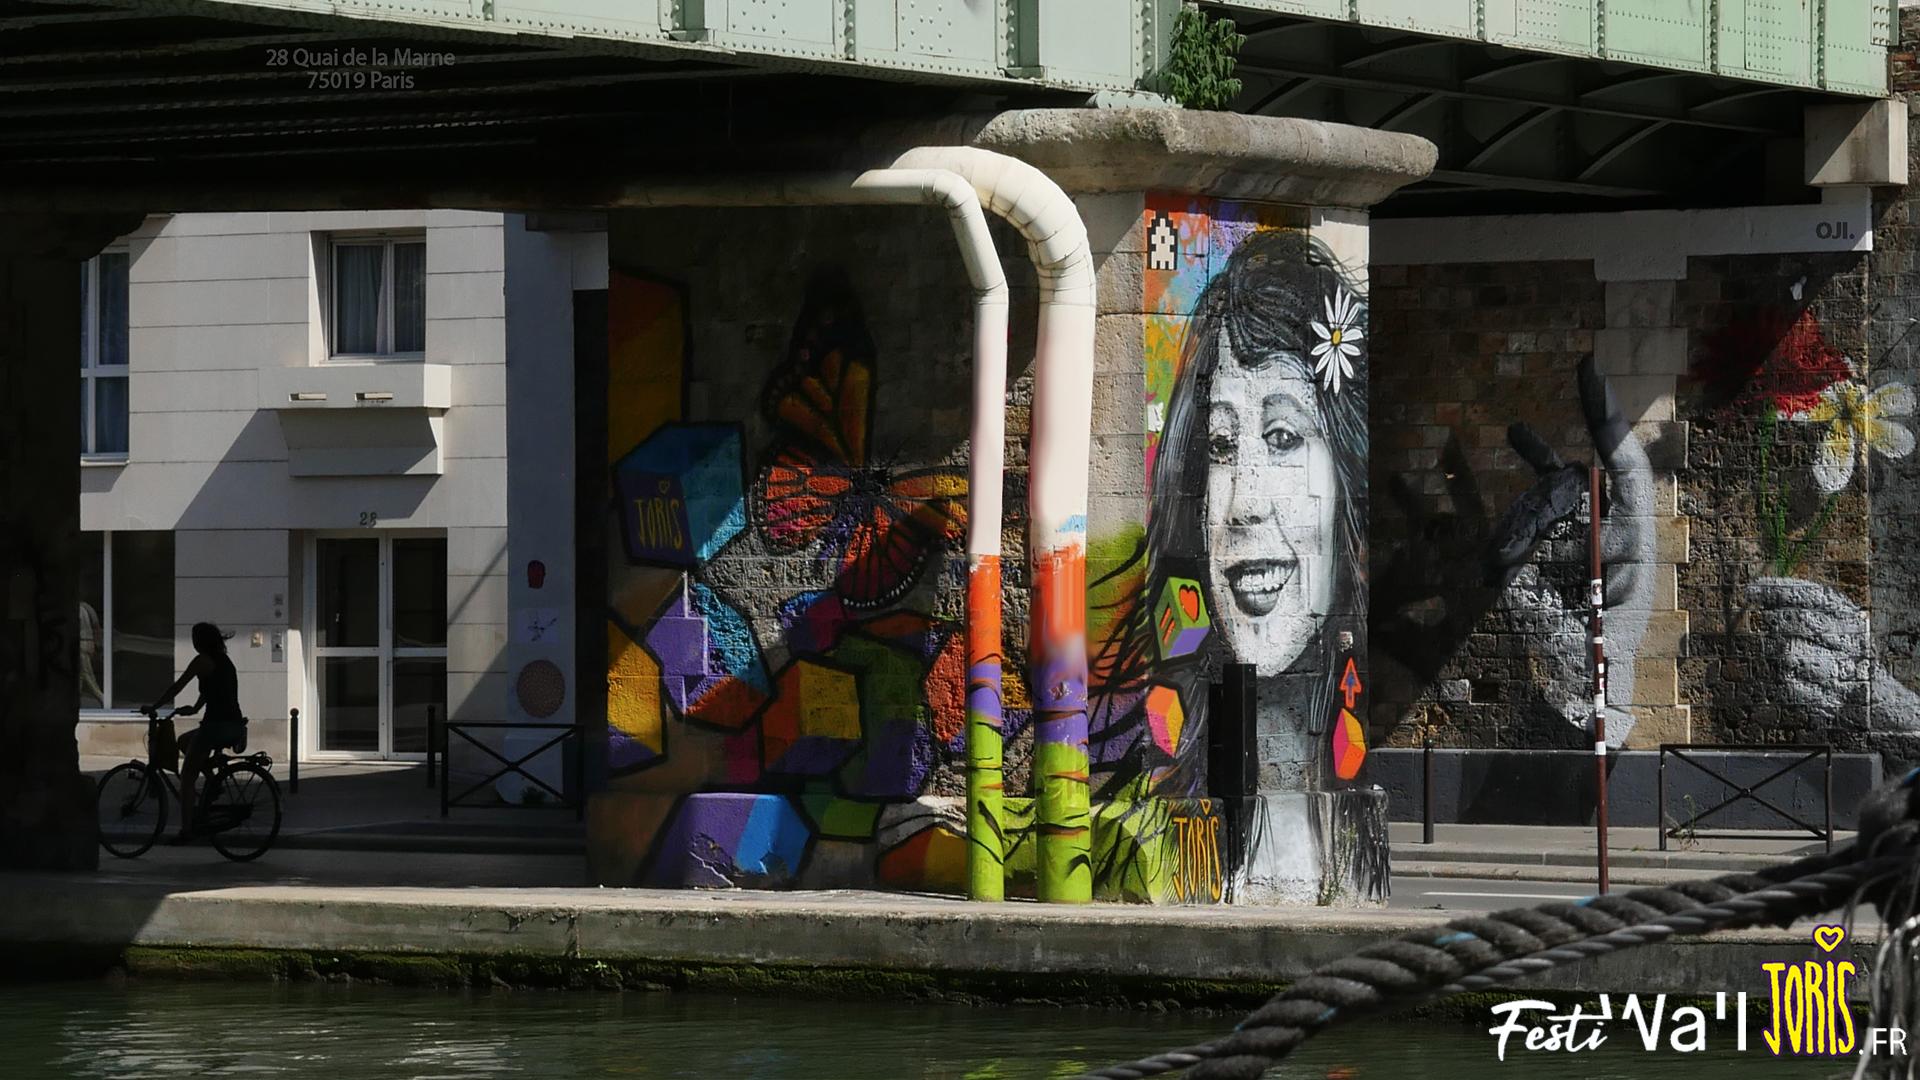 DECORATION-GRAFFITI-FRESQUE-TABLEAU-STREET-ART-PARIS-06